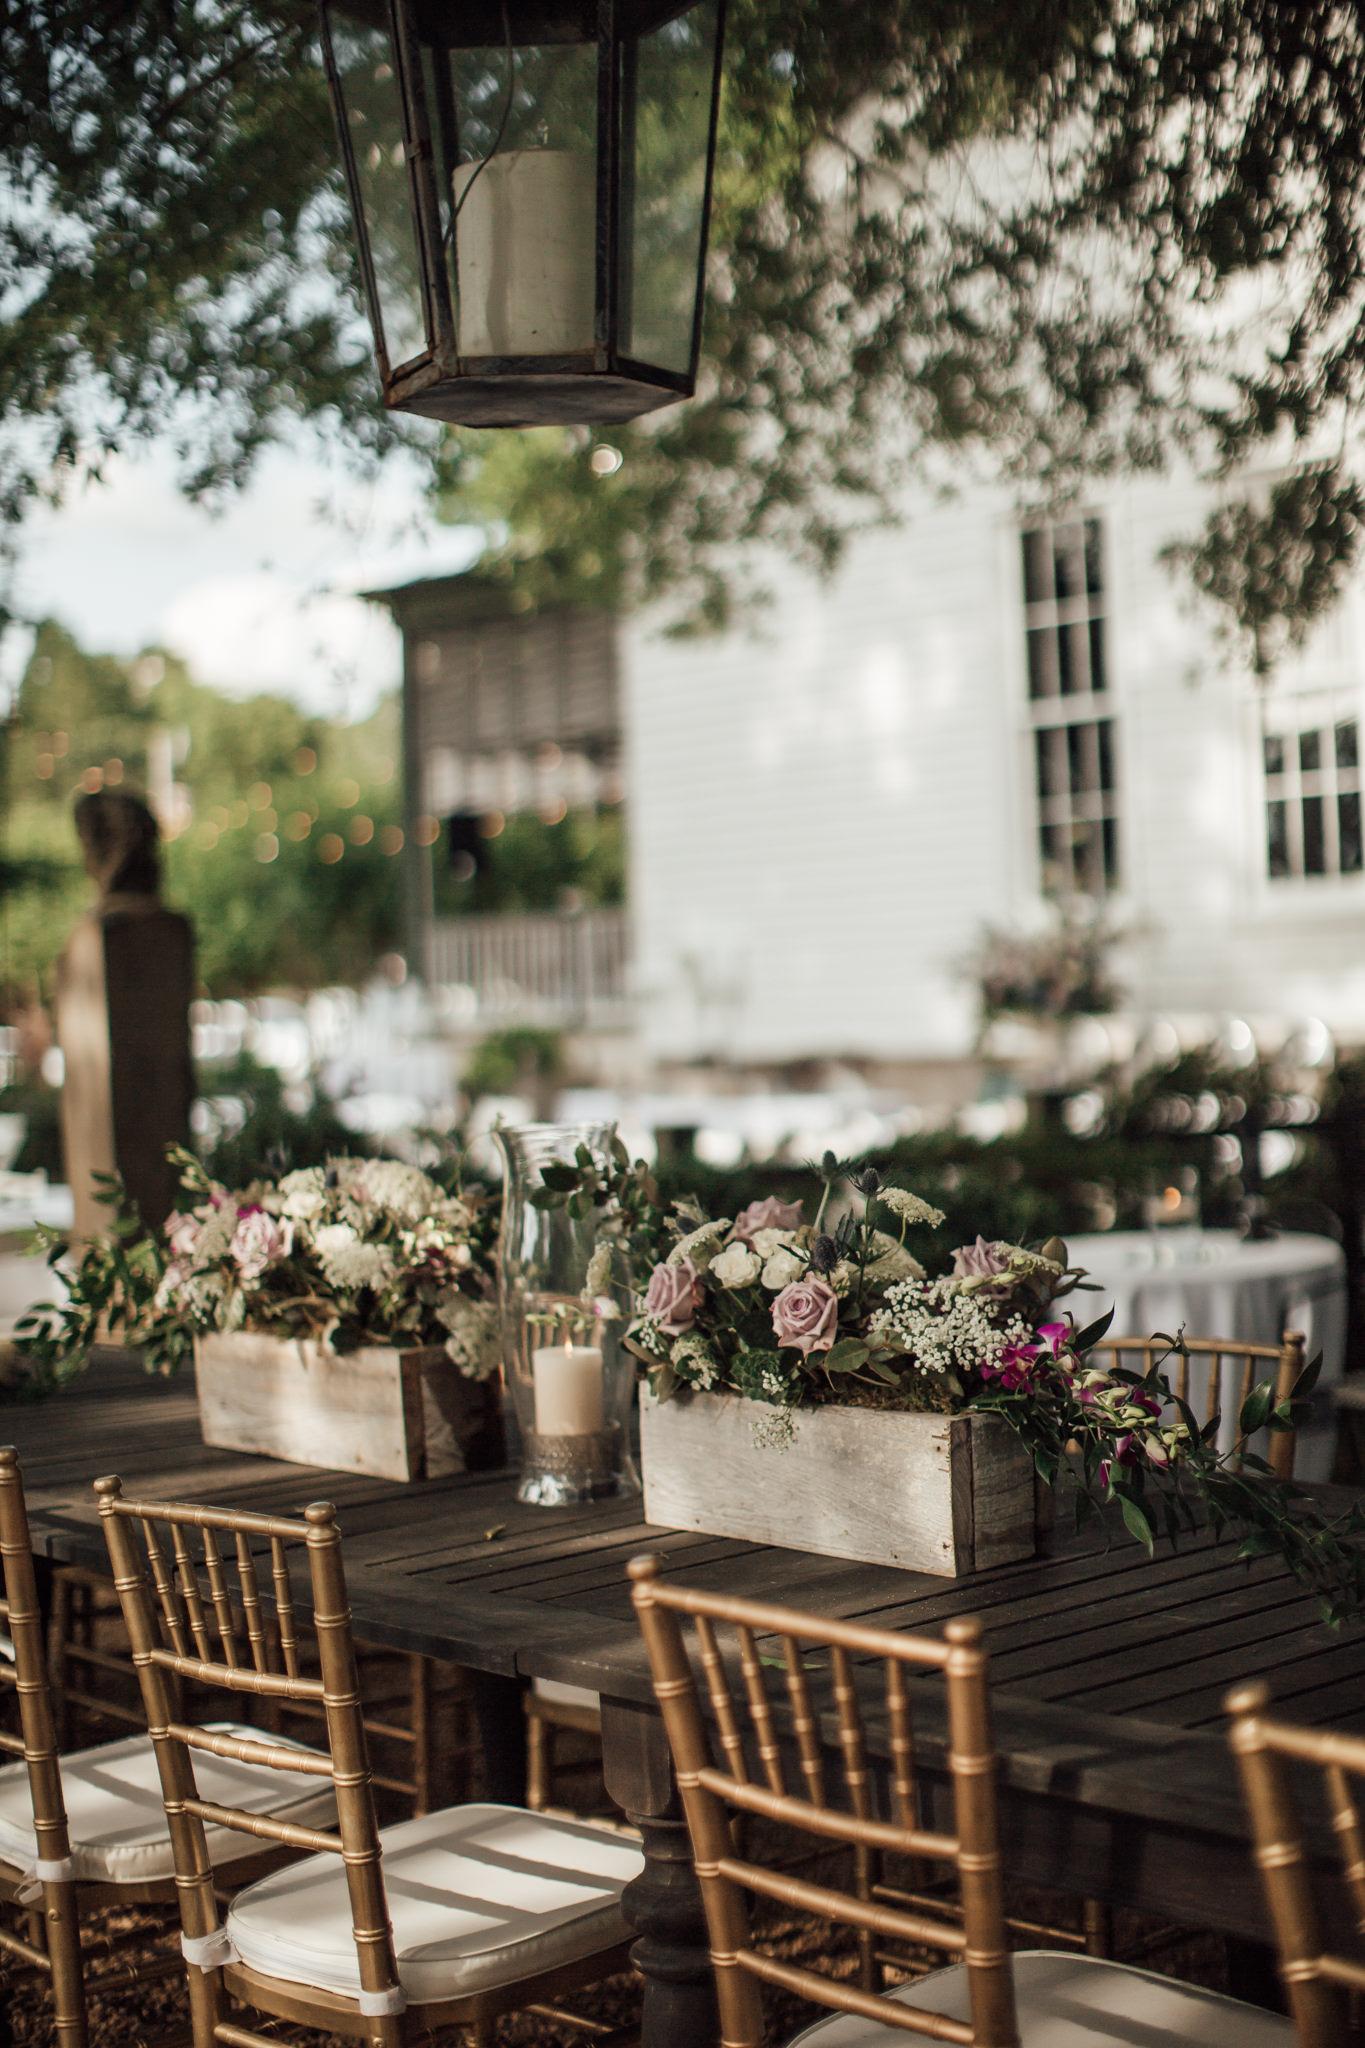 cassie-cook-photography-memphis-wedding-photographer-hedge-farm-wedding-venue-124.jpg